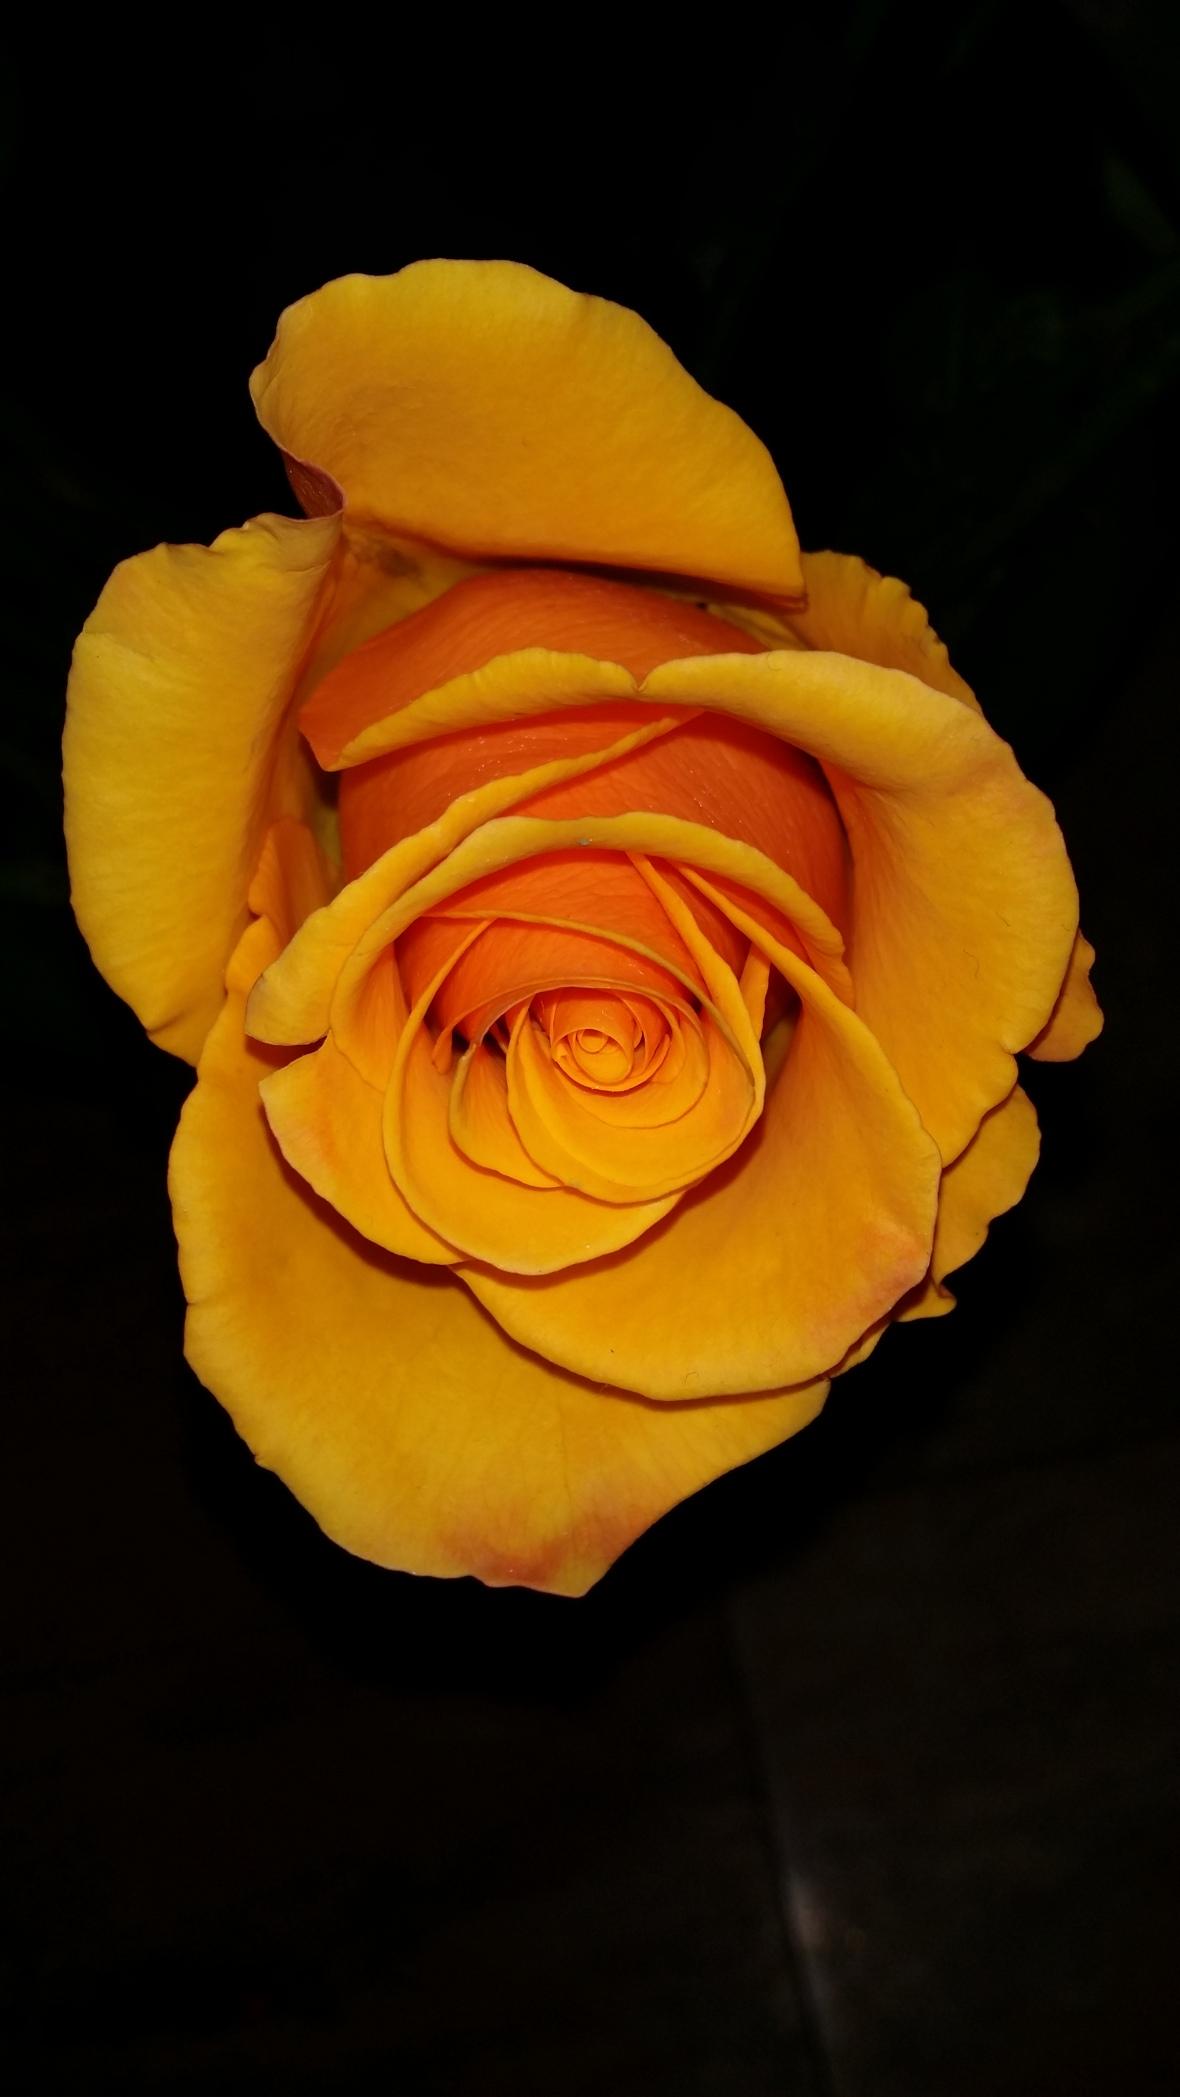 Golden Yellow Rose Black Background